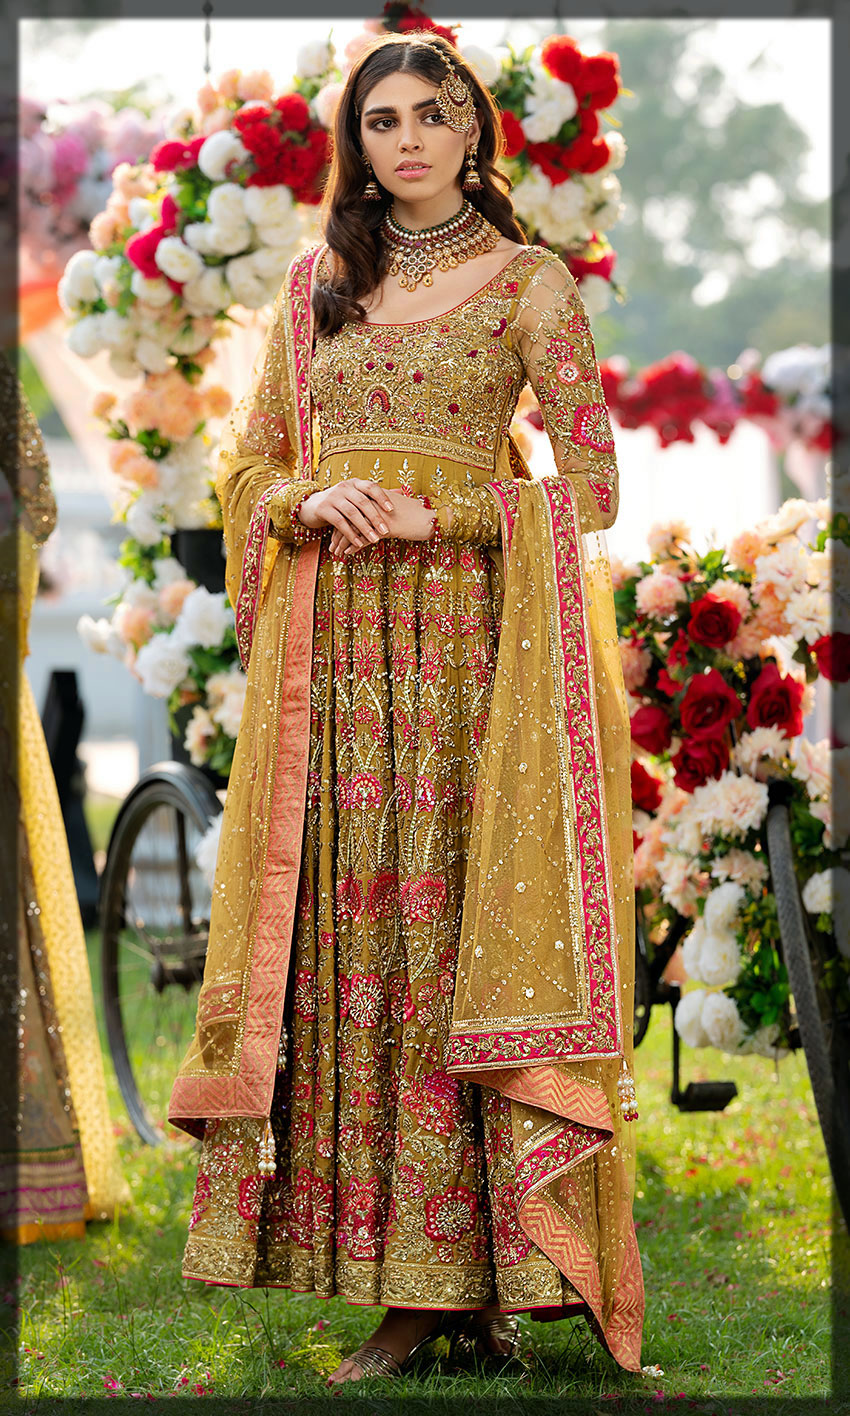 fancy frock for the mehndi bride